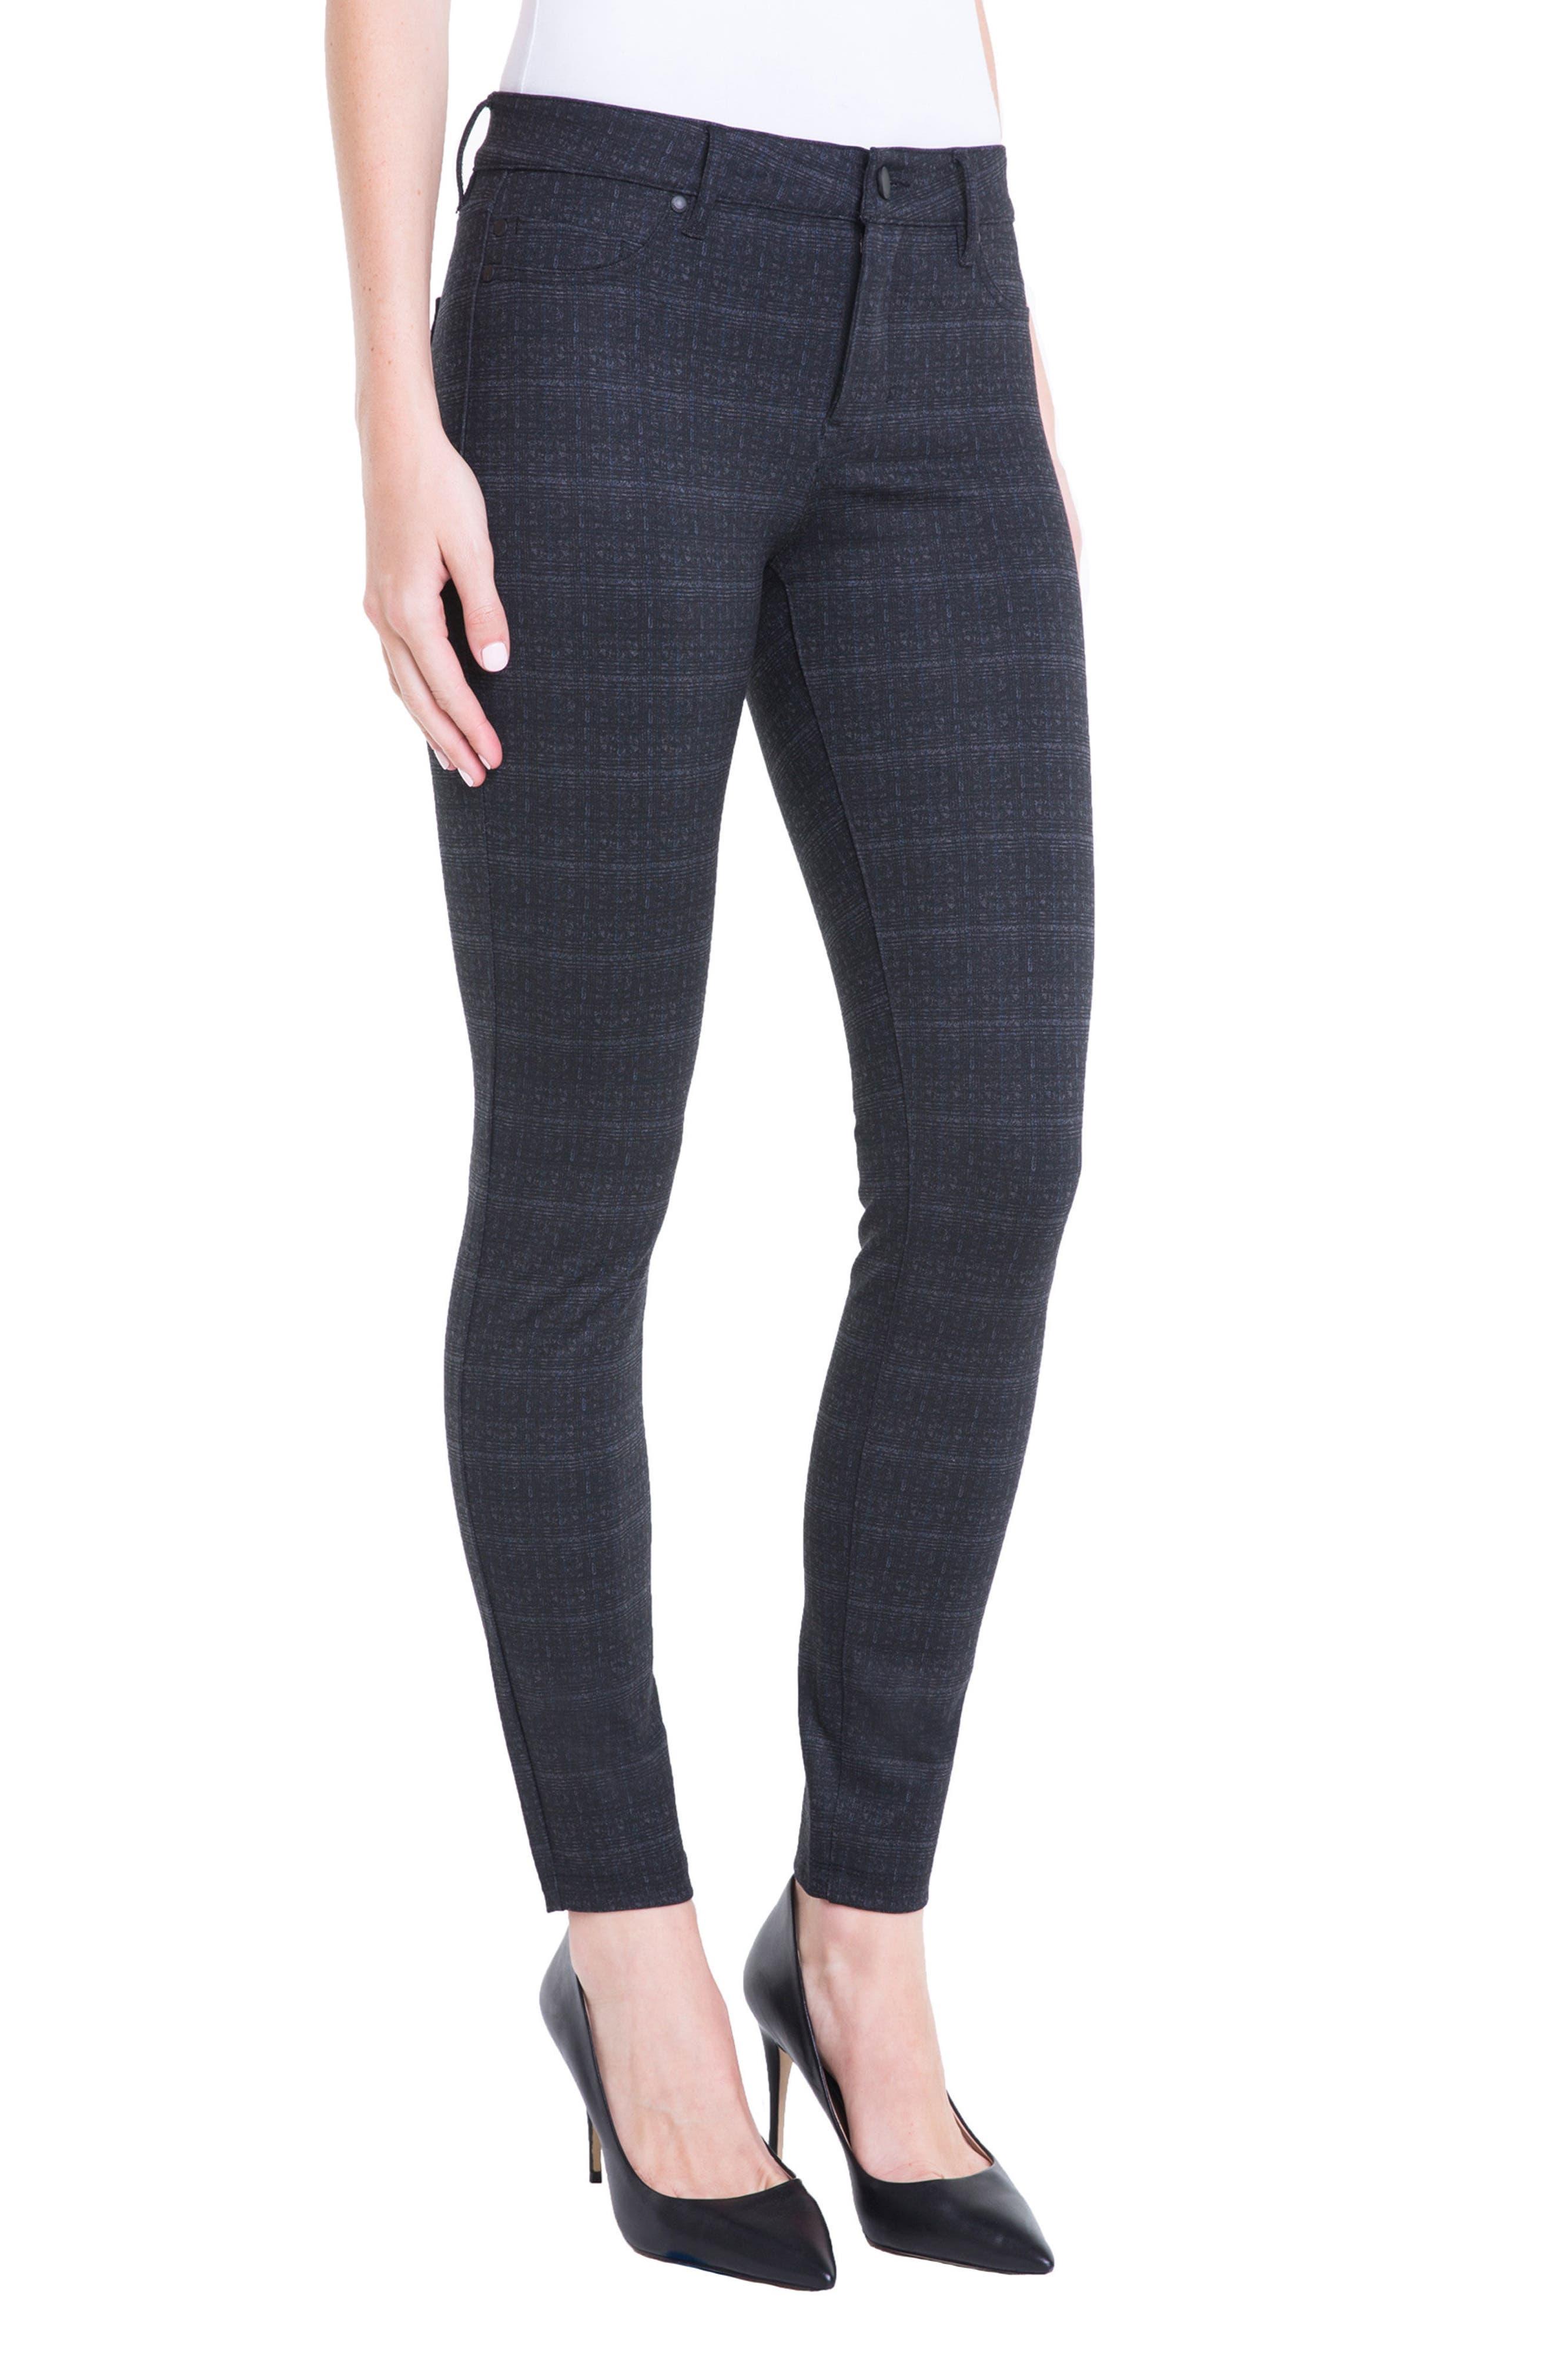 Plaid Super Skinny Ponte Knit Pants,                             Alternate thumbnail 3, color,                             Charcoal Shadow Plaid